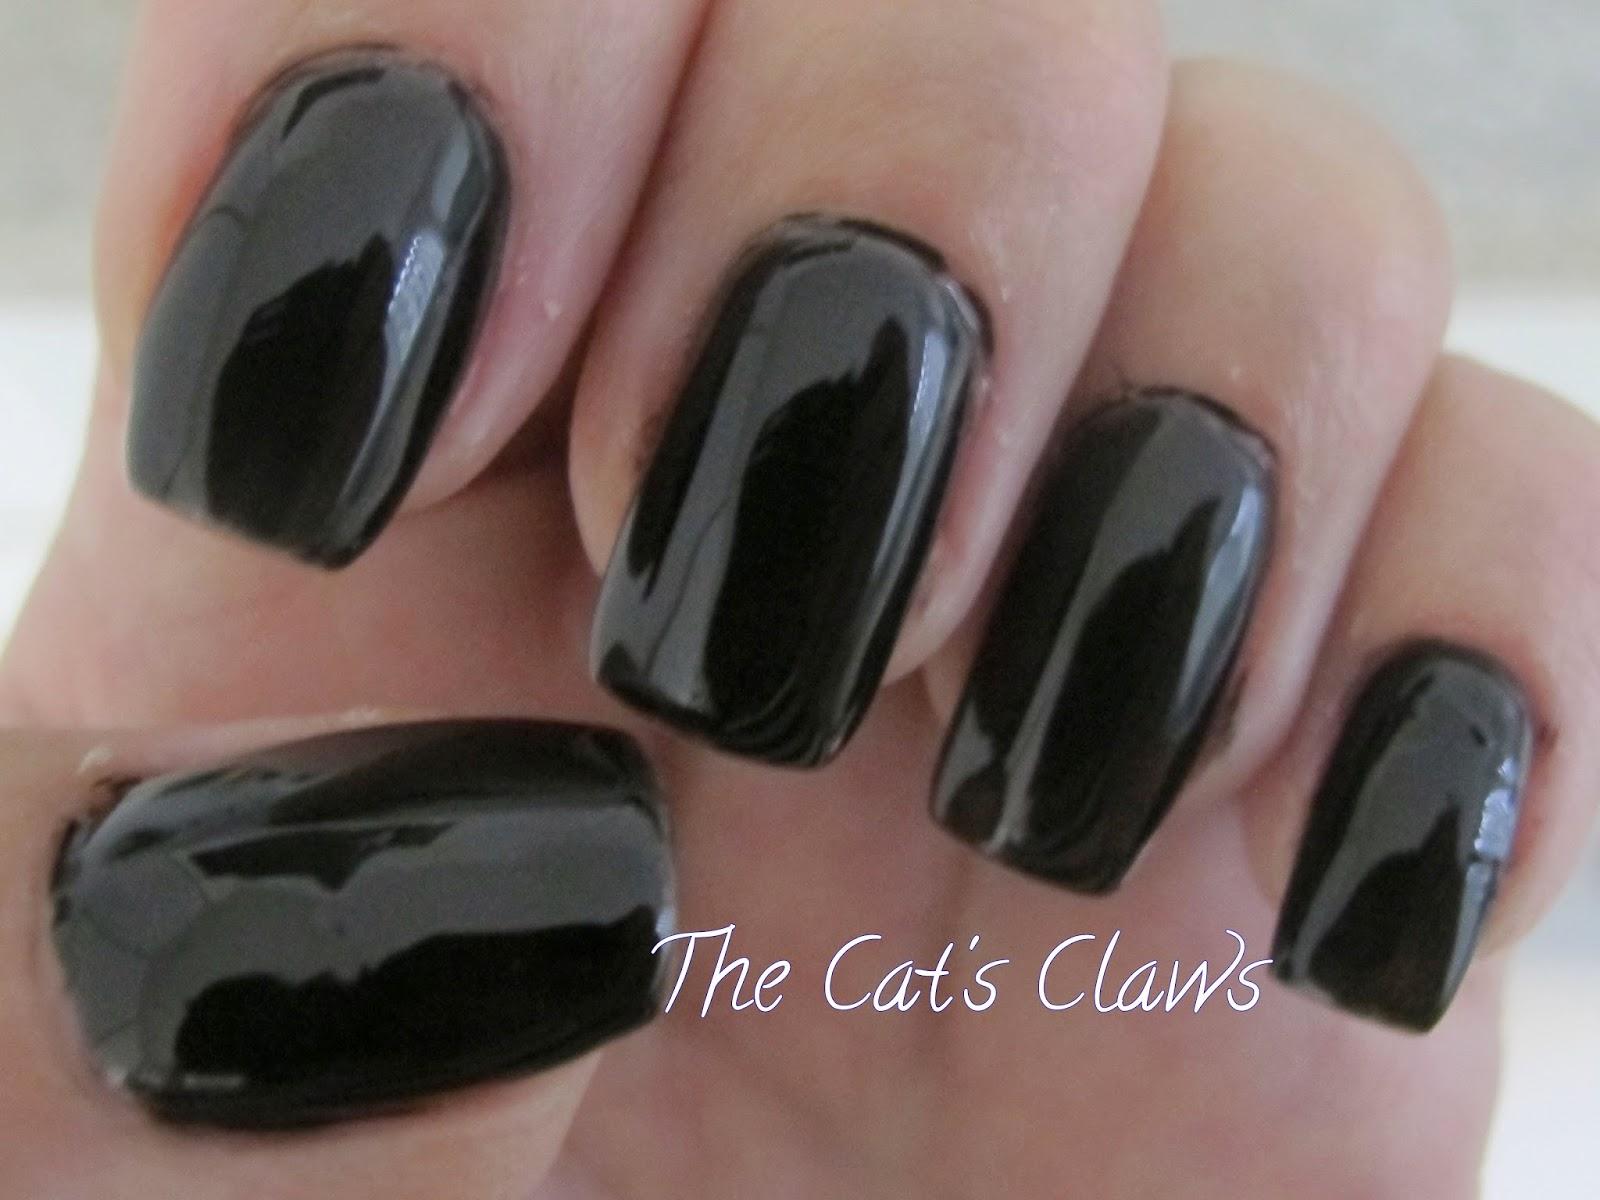 The Cat\'s Claws: Qutique Gel Nails = Perfection!